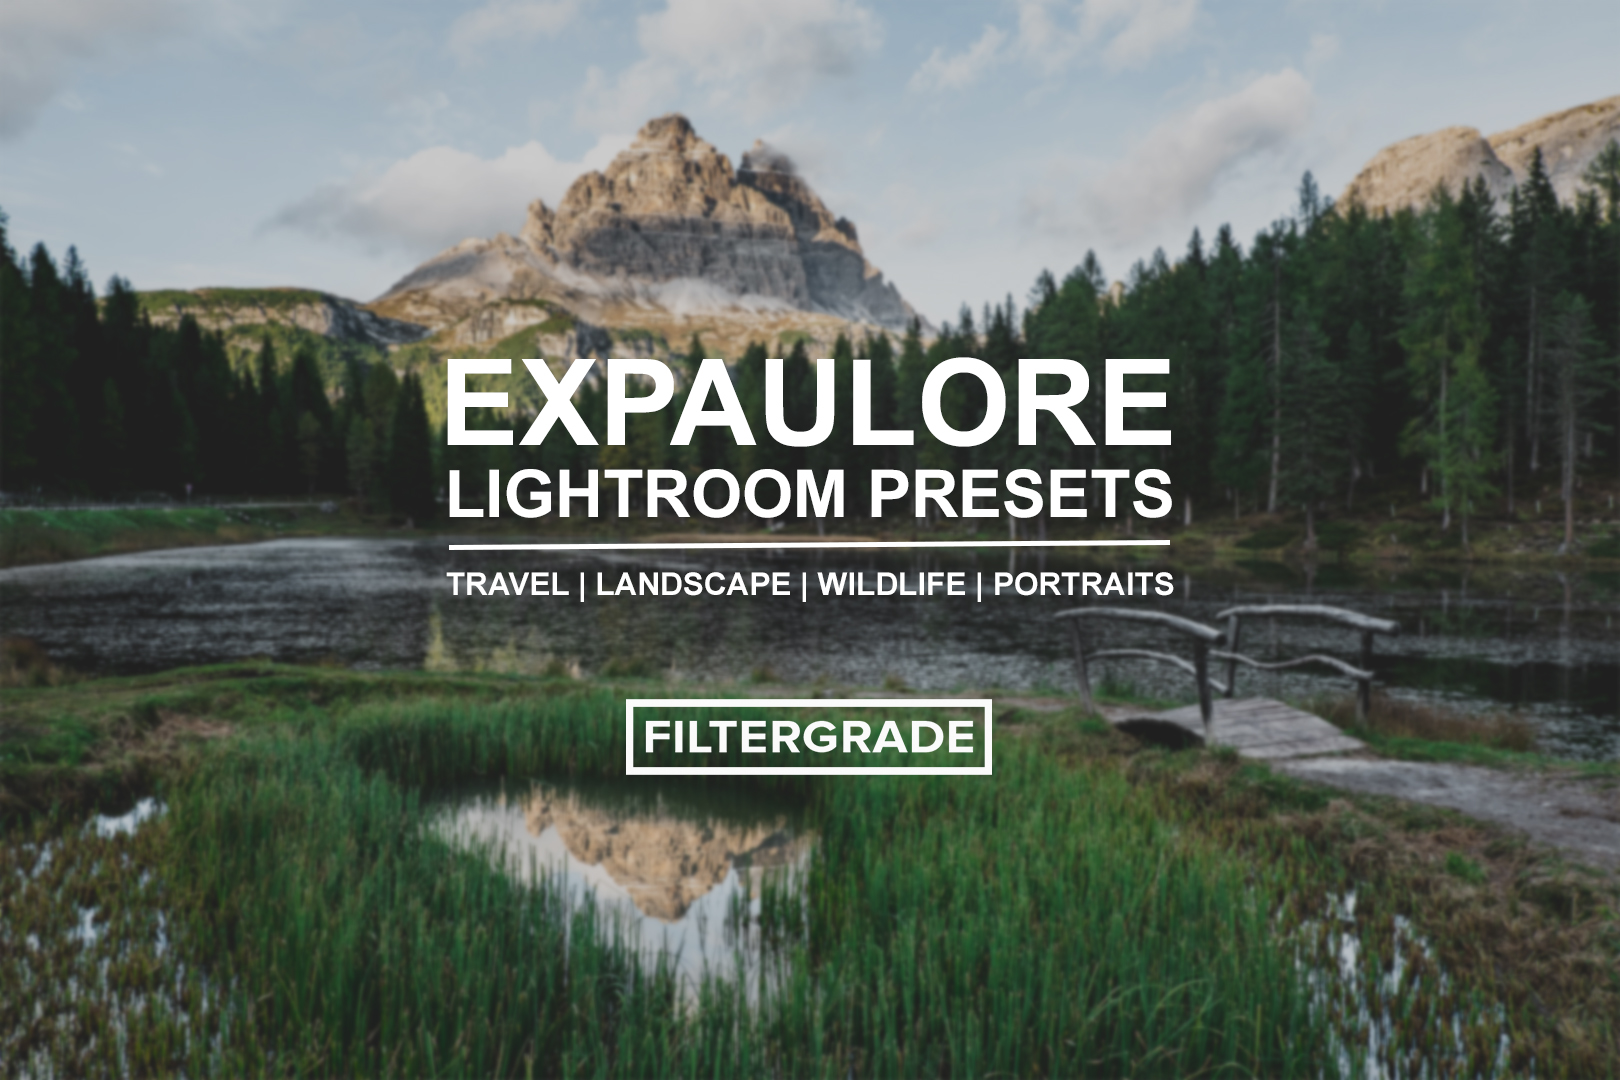 expaulore Lightroom Presets